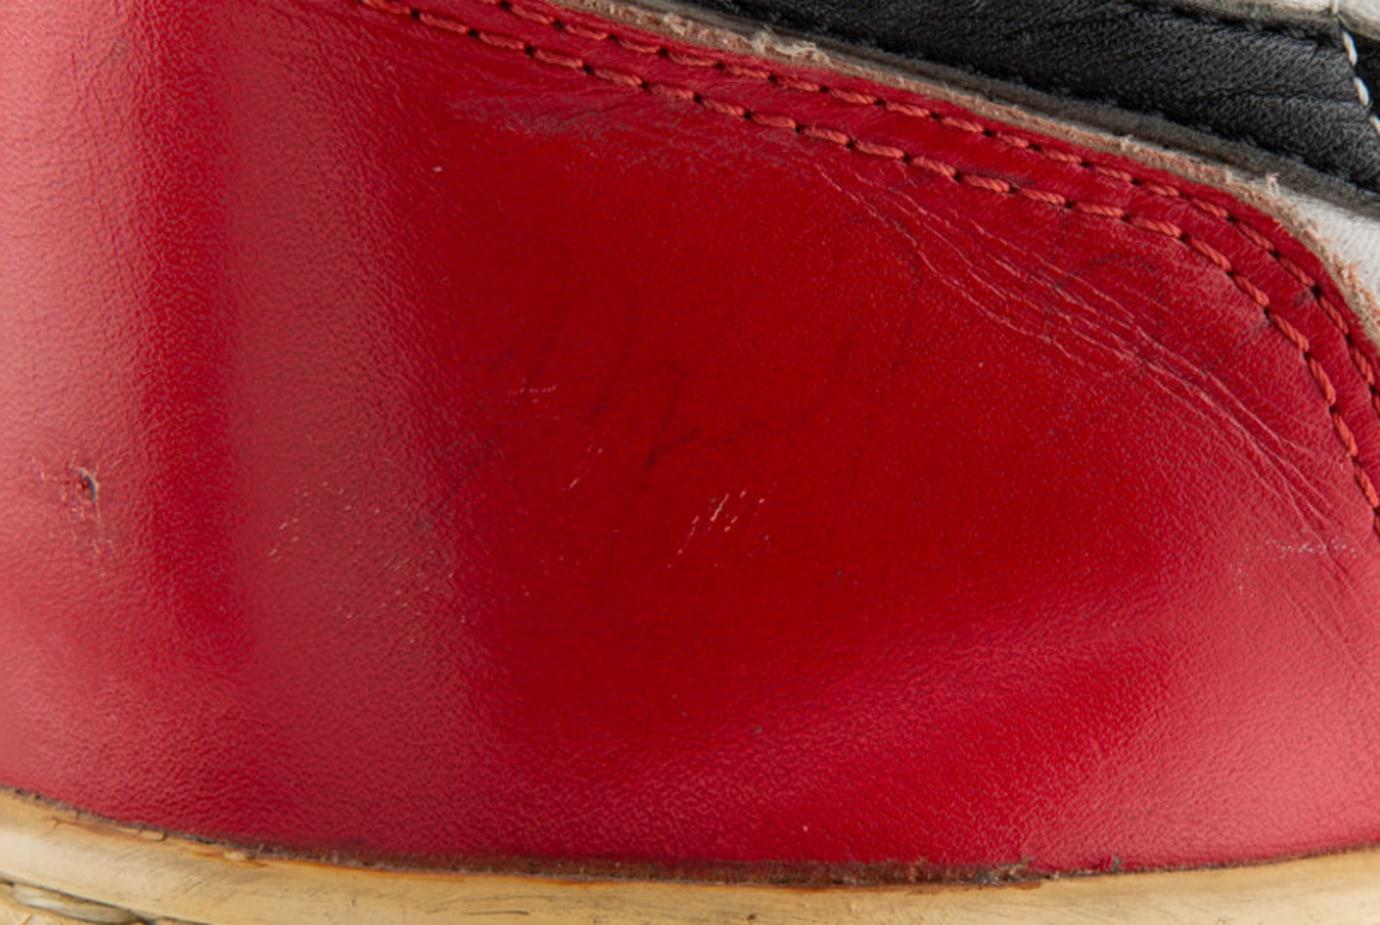 Game Worn, Autographed 1984-1985 Air Jordan 1 'Black Toe' 5